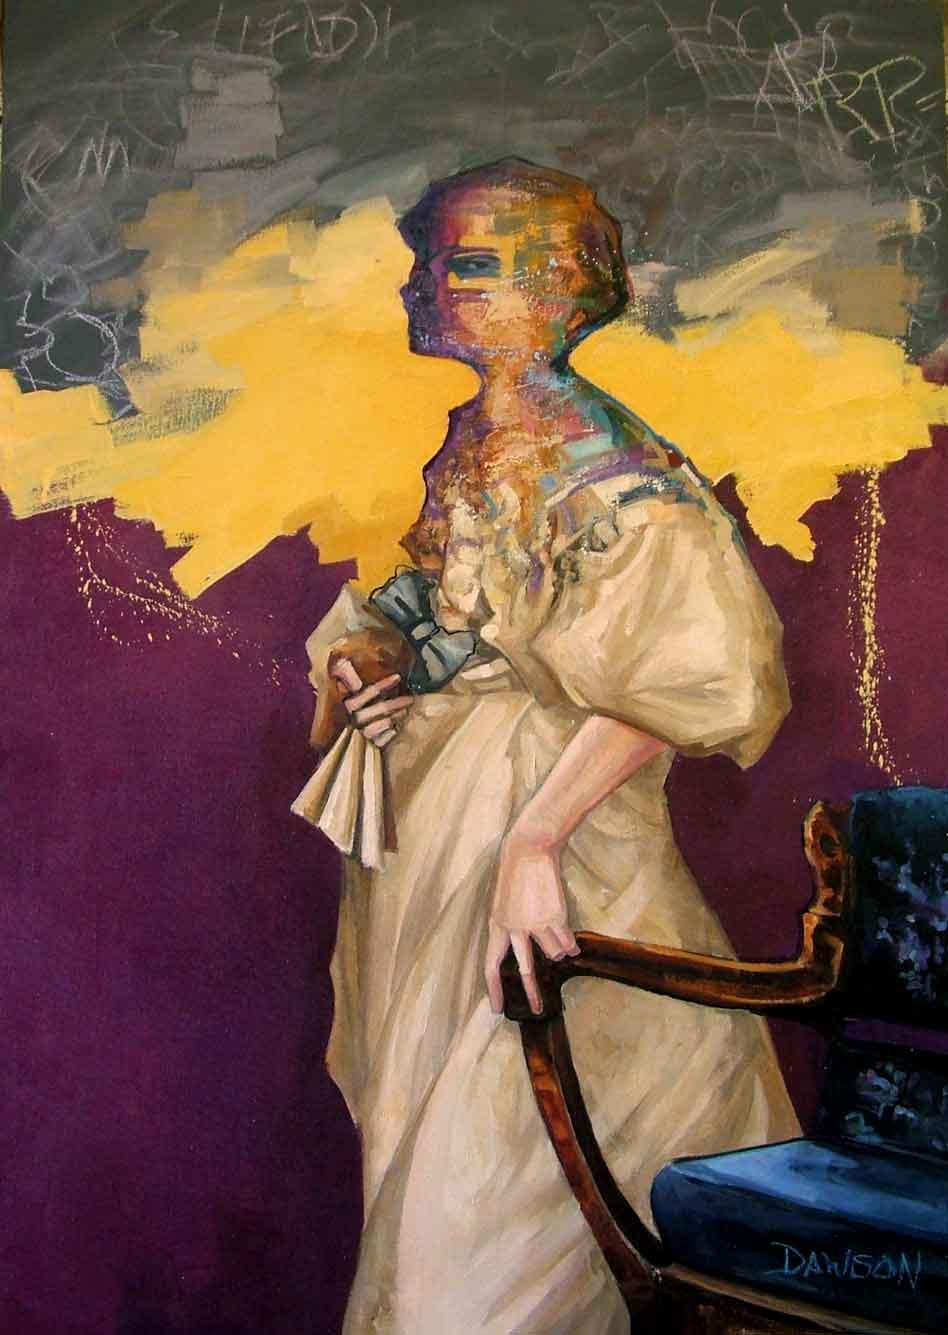 """Lavender Days,"" John Dawson, oil on canvas, 45"" x 32"""